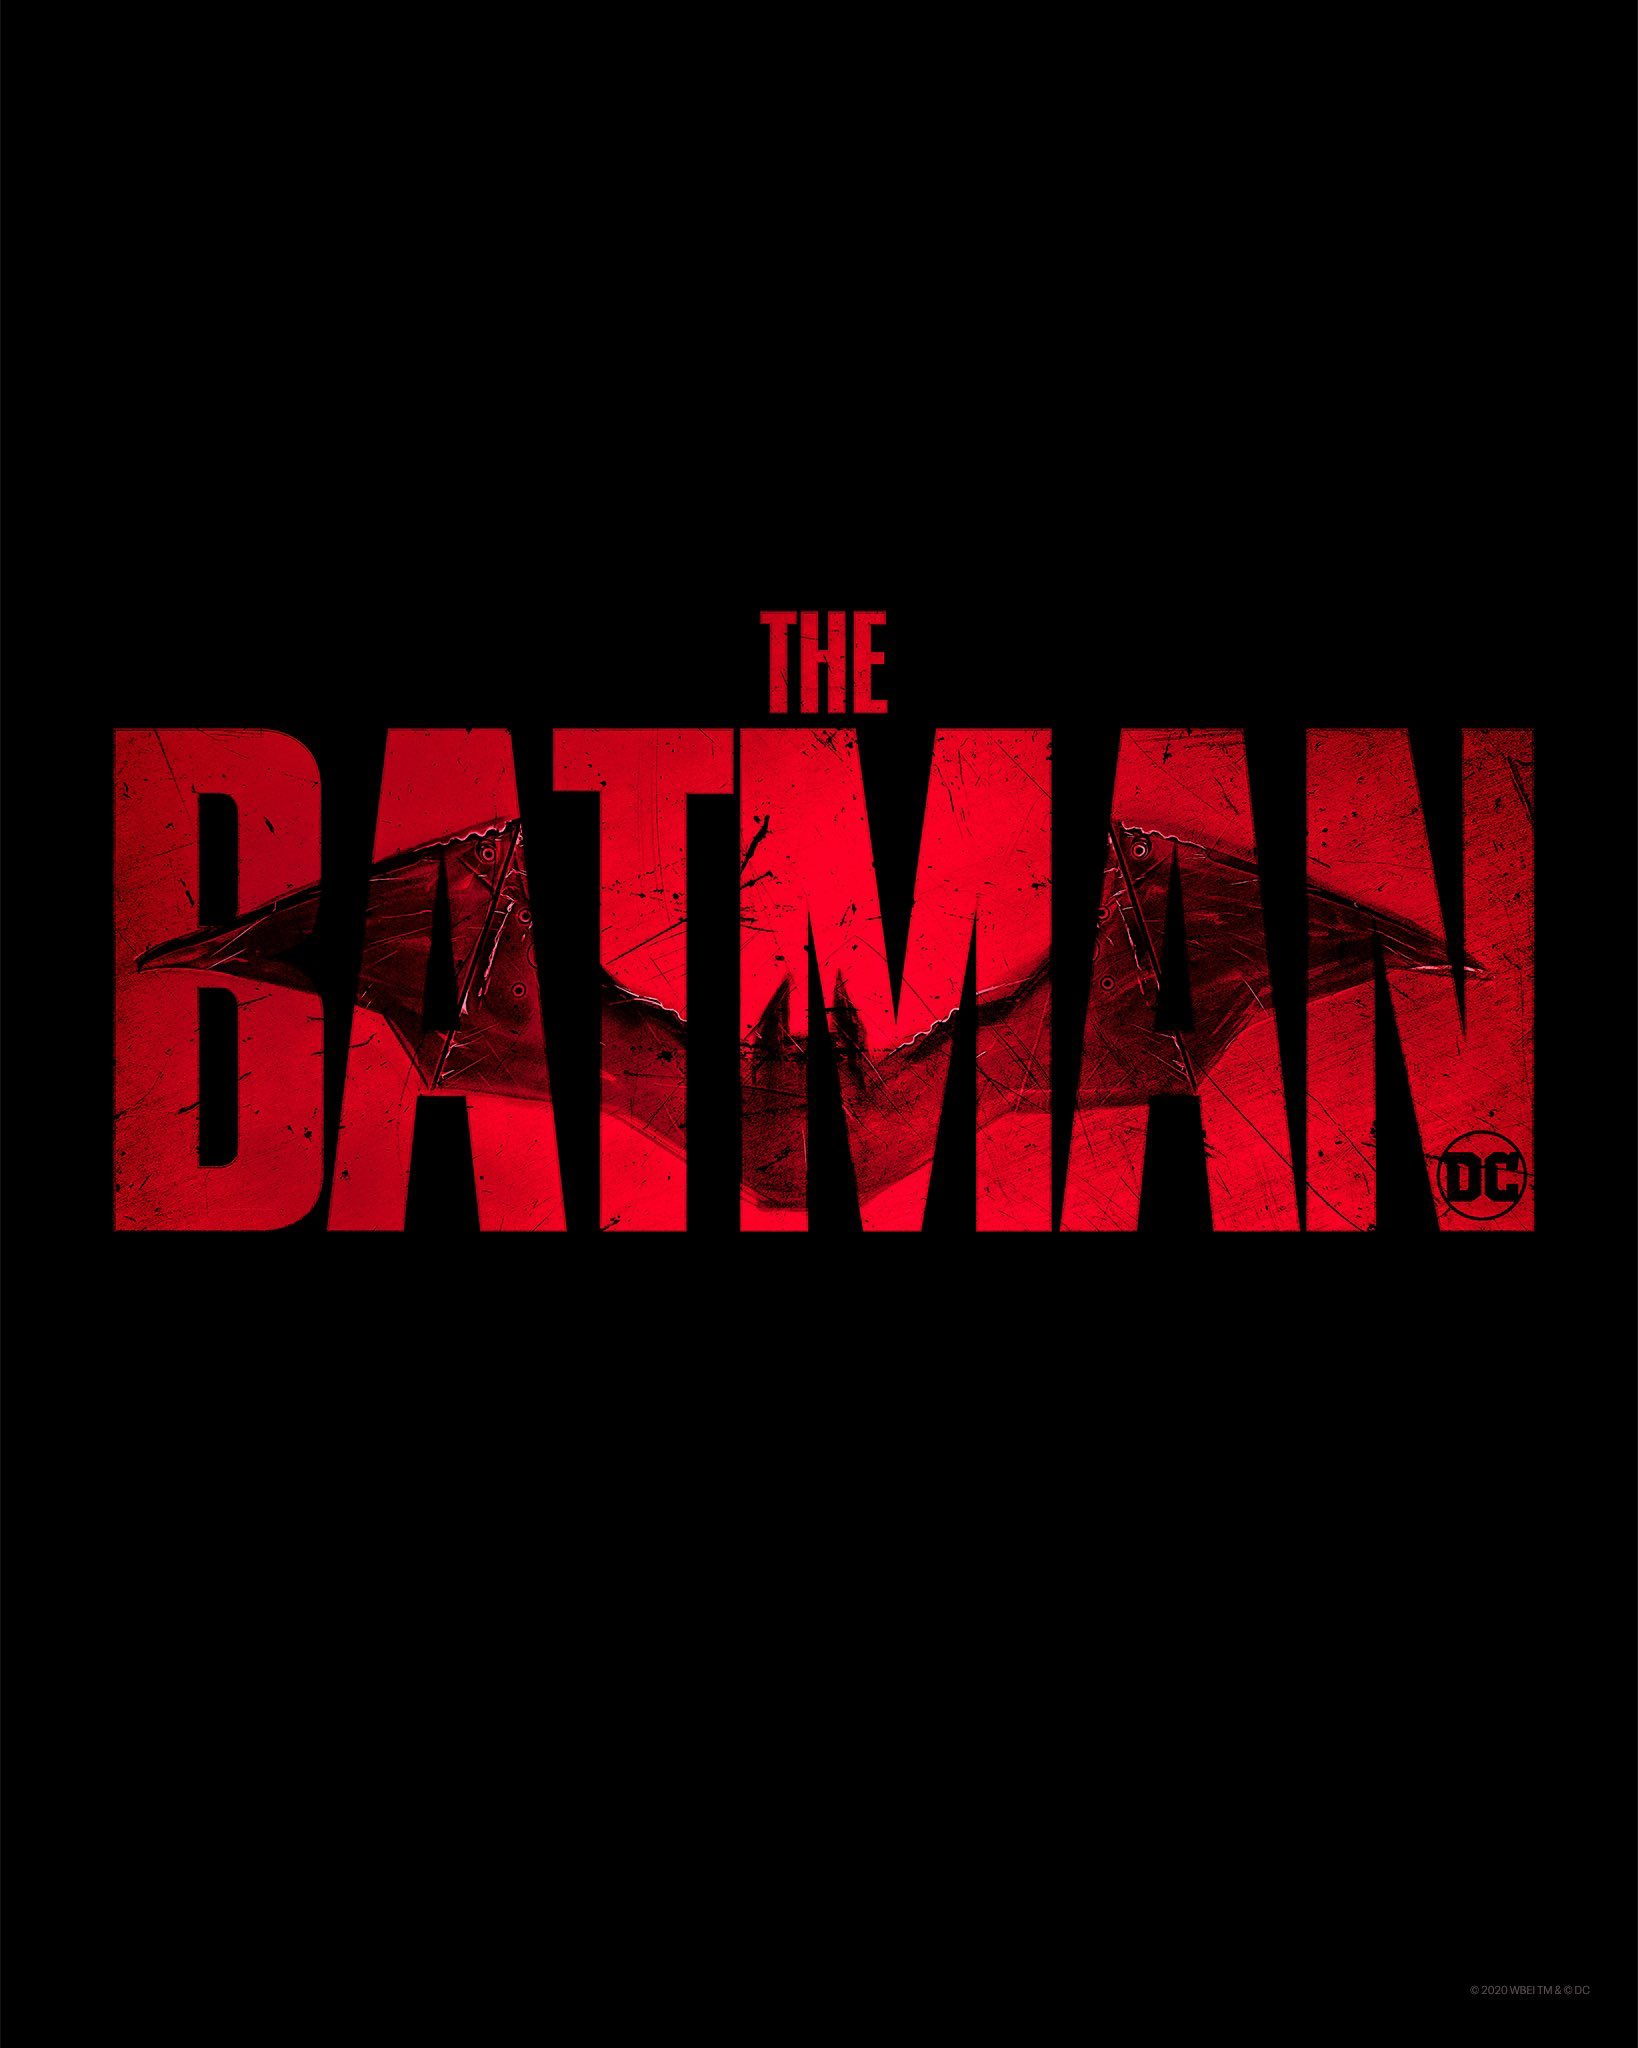 La anticipada The Batman revela primer vistazo al logo oficial y teaser póster